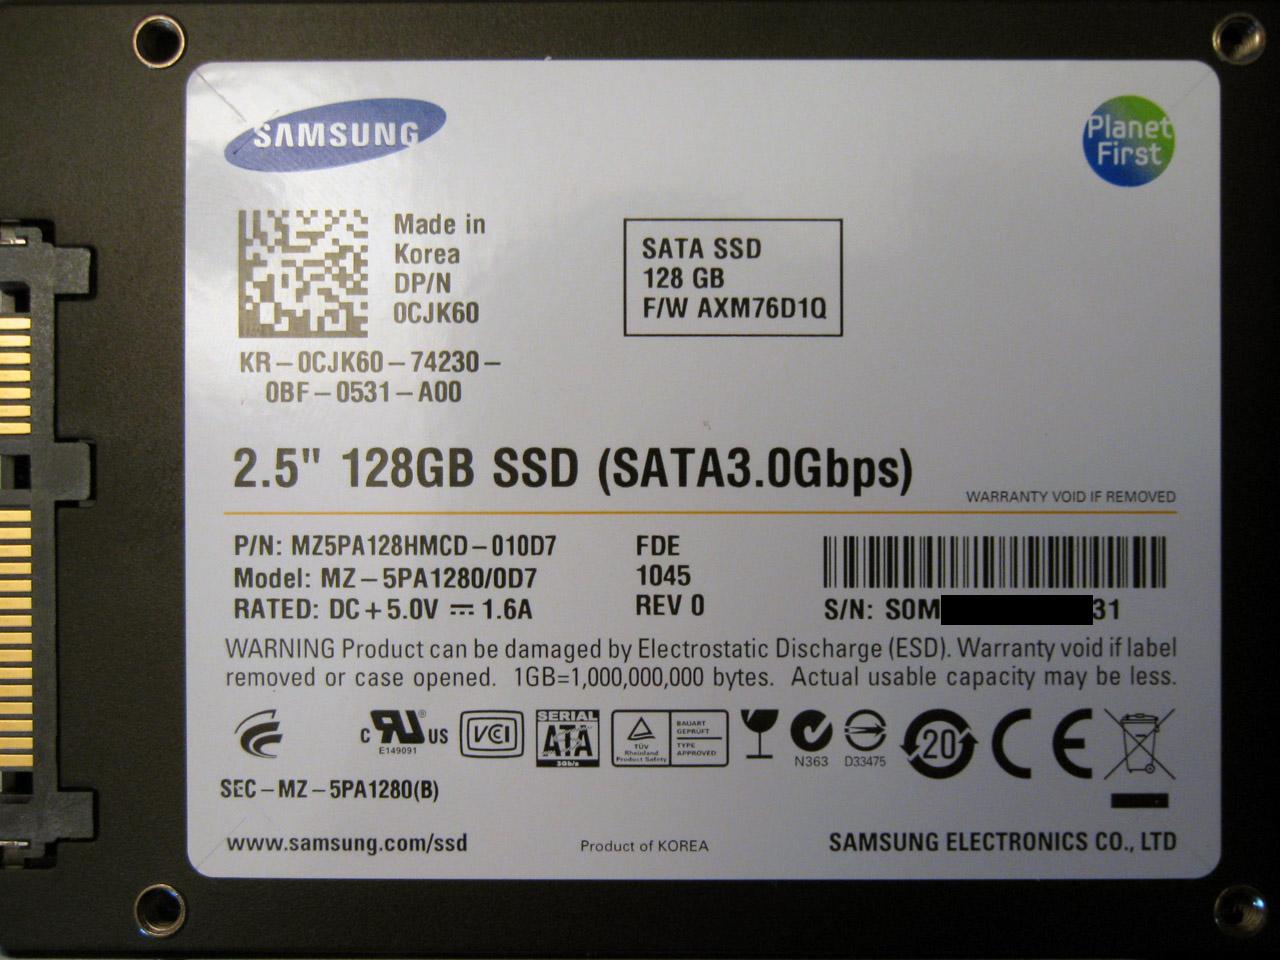 SAMSUNG SSD PM810 WINDOWS 7 X64 DRIVER